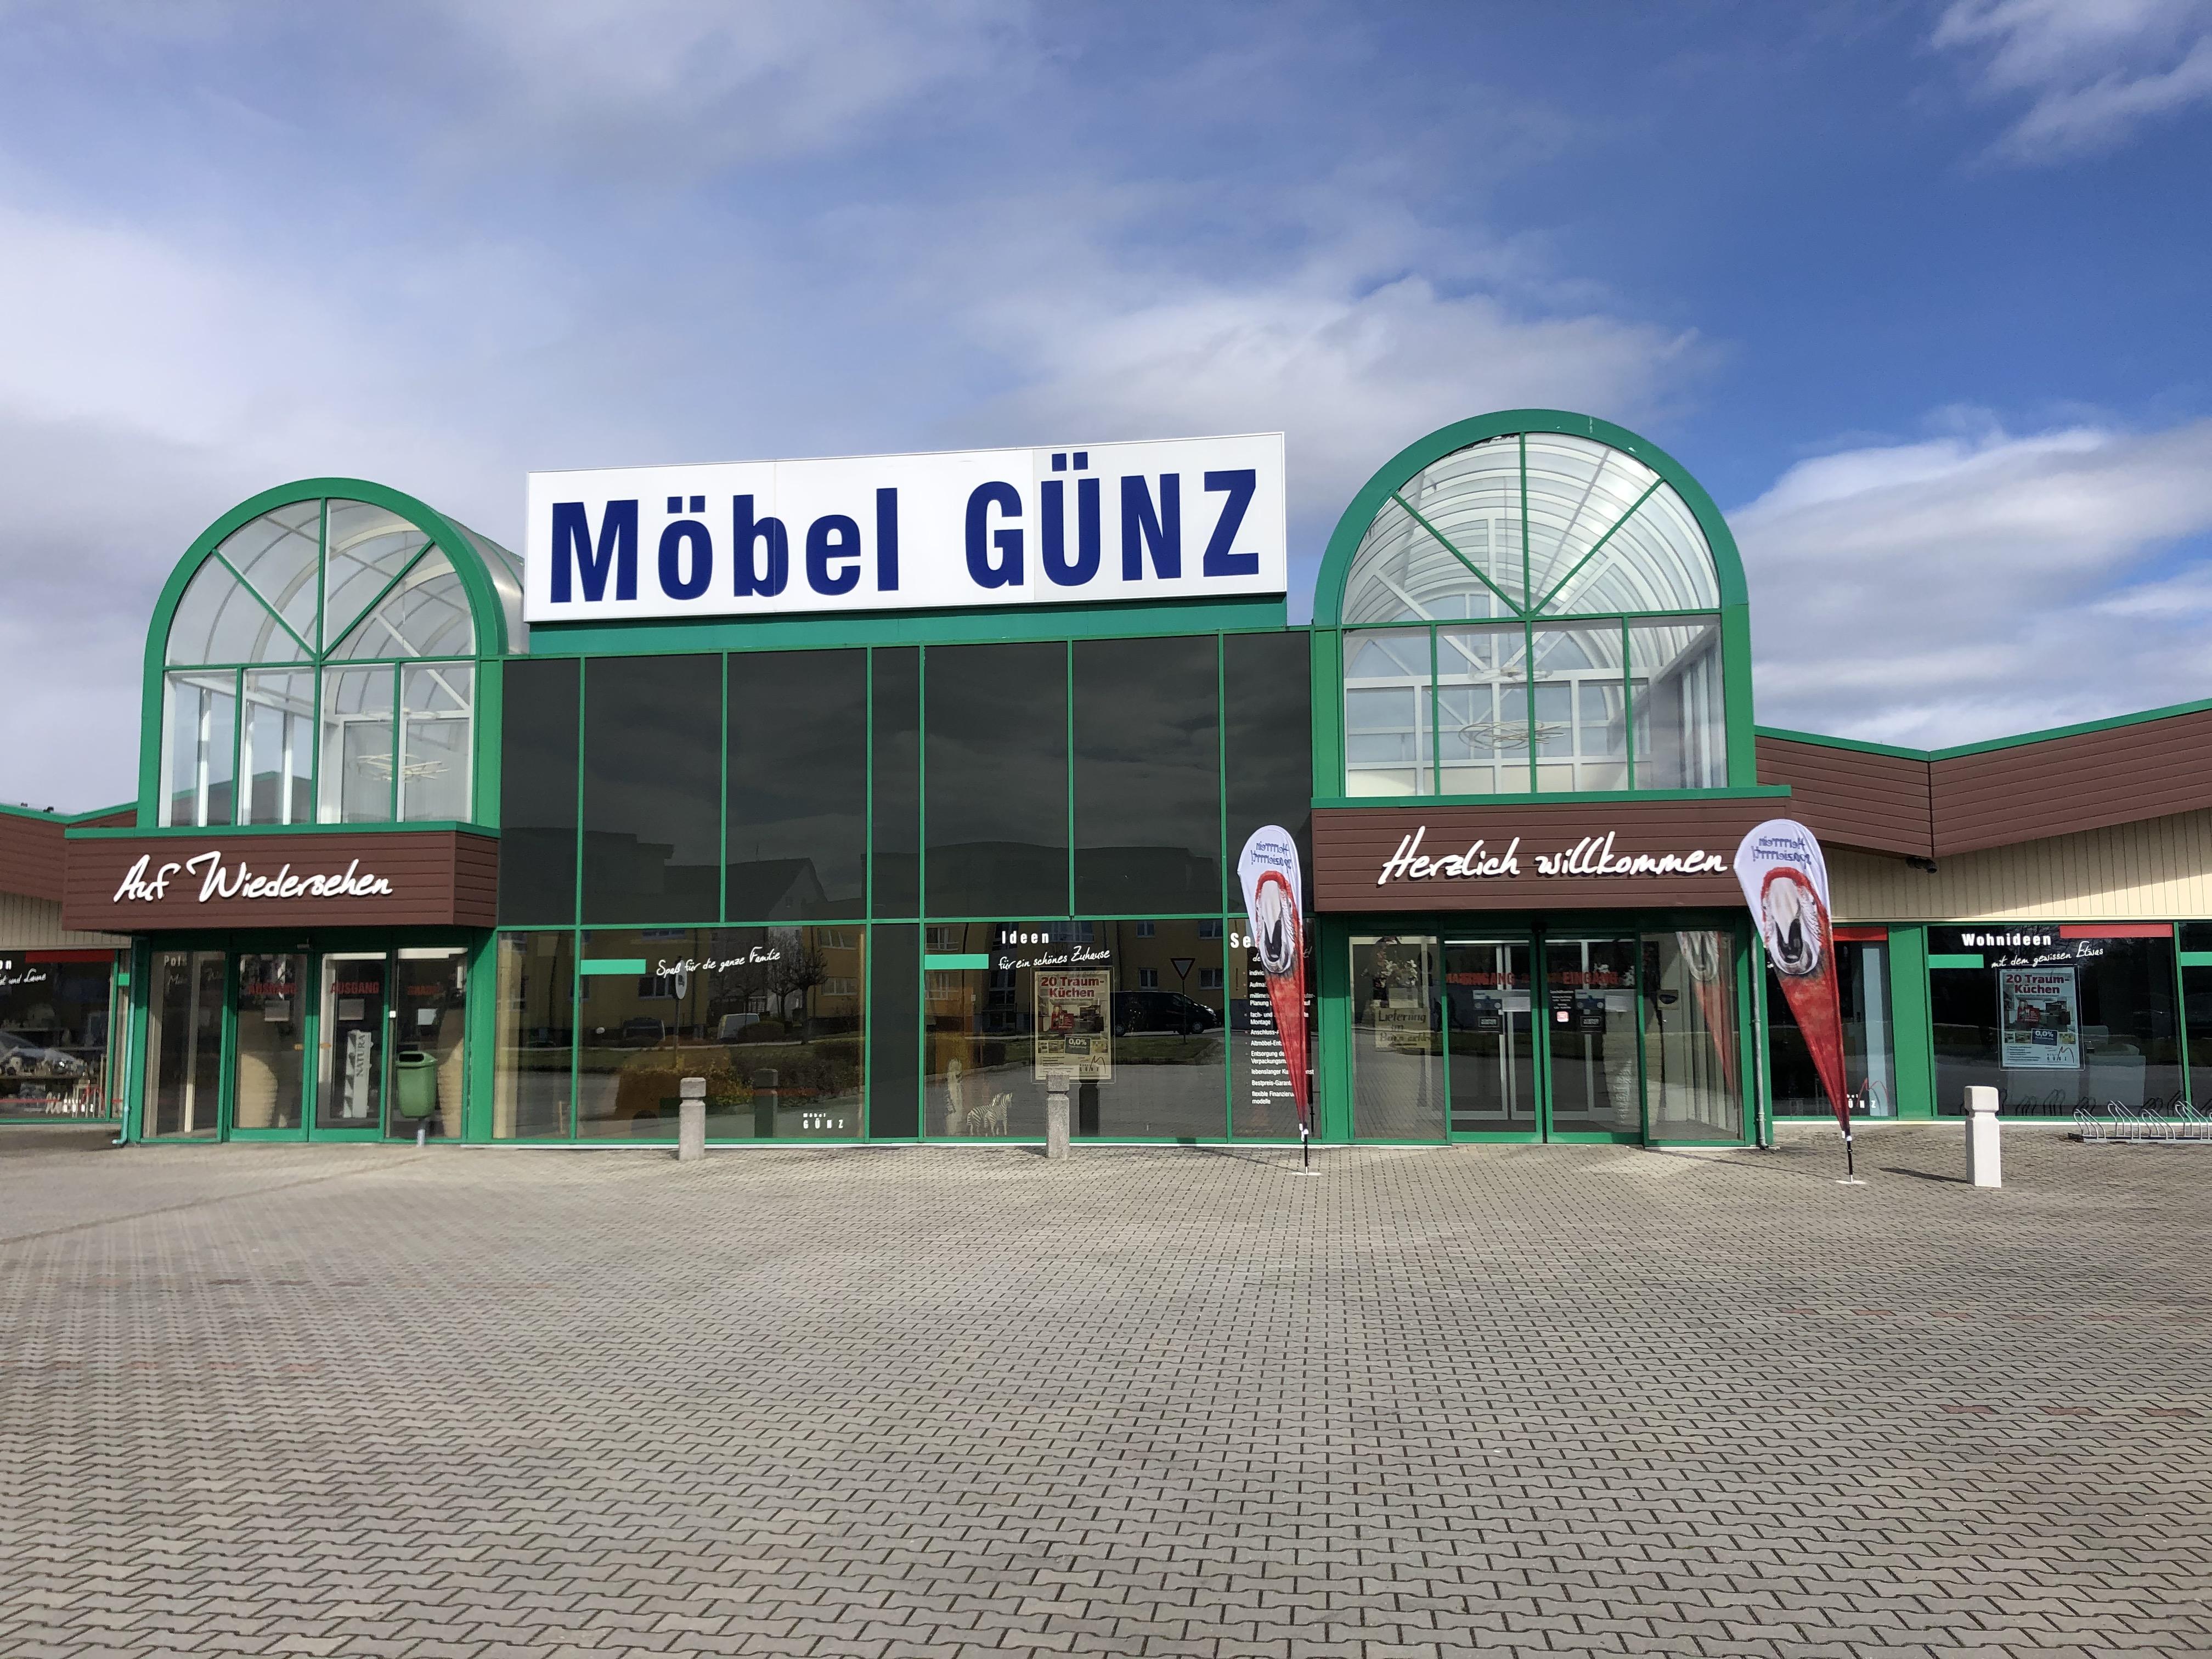 moebel-guenz-gmbh--co-kg-naunhof banner